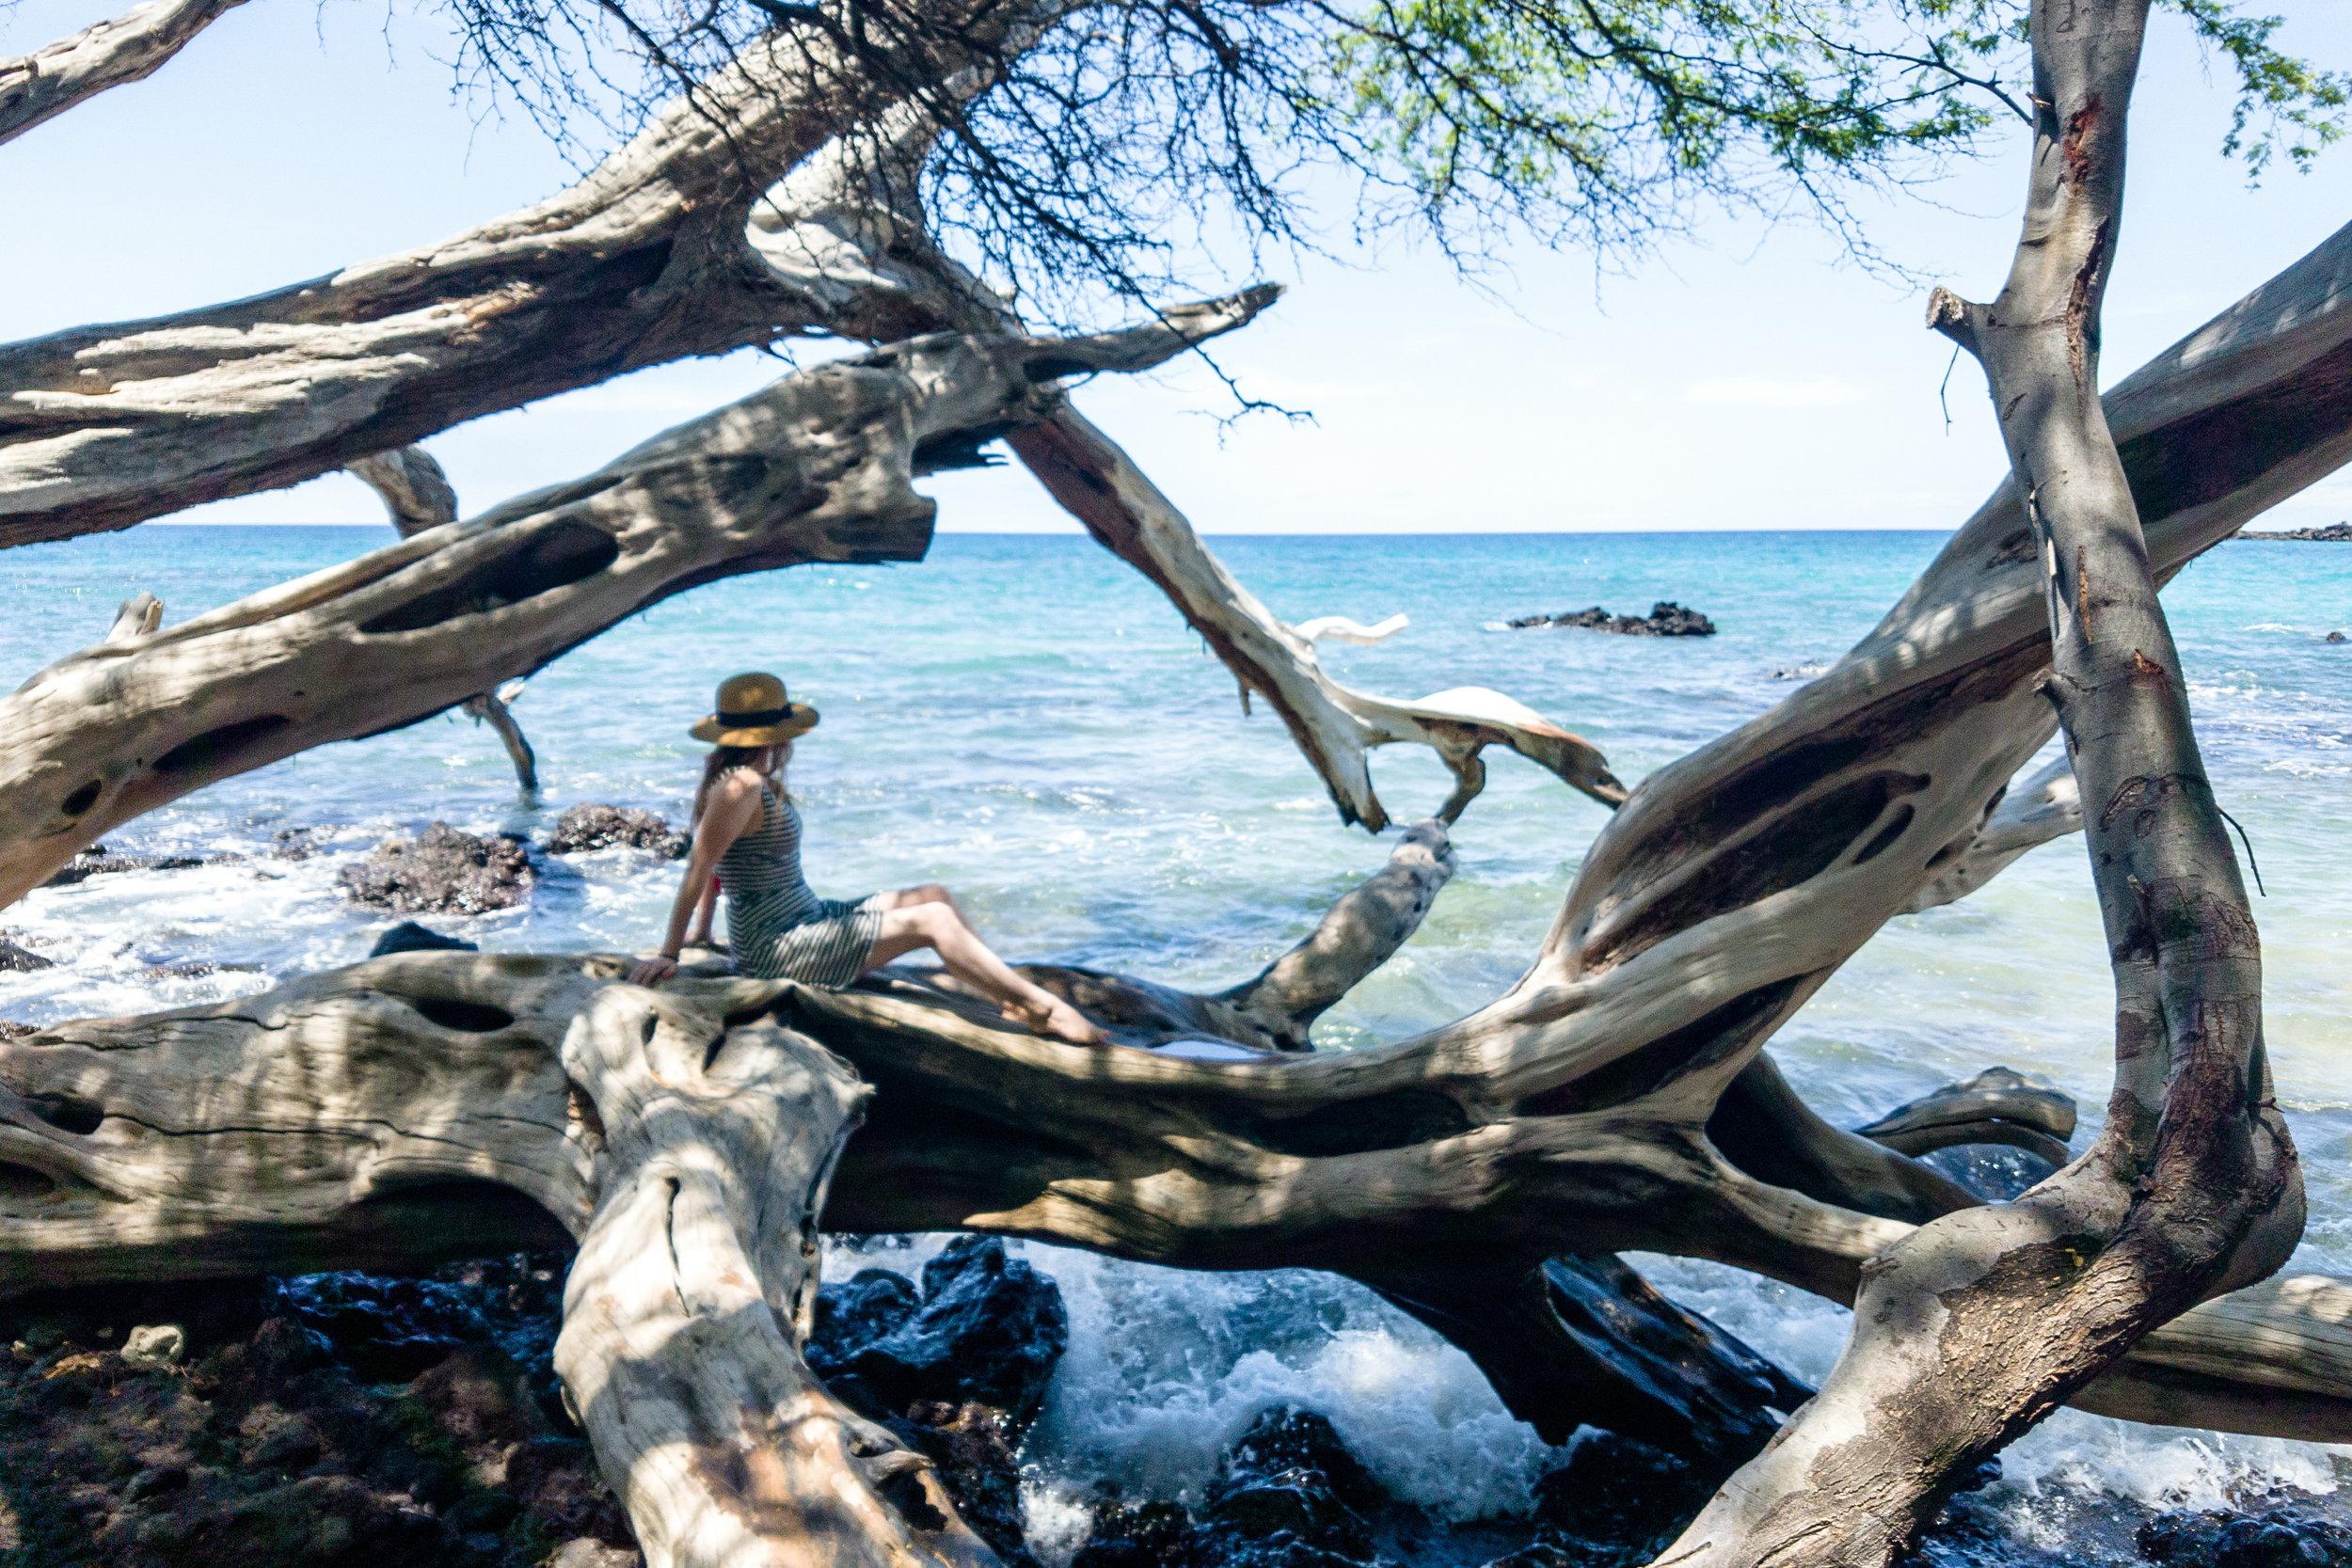 New favorite beach on the Big Island! So many sculptural trees providing plenty of shade